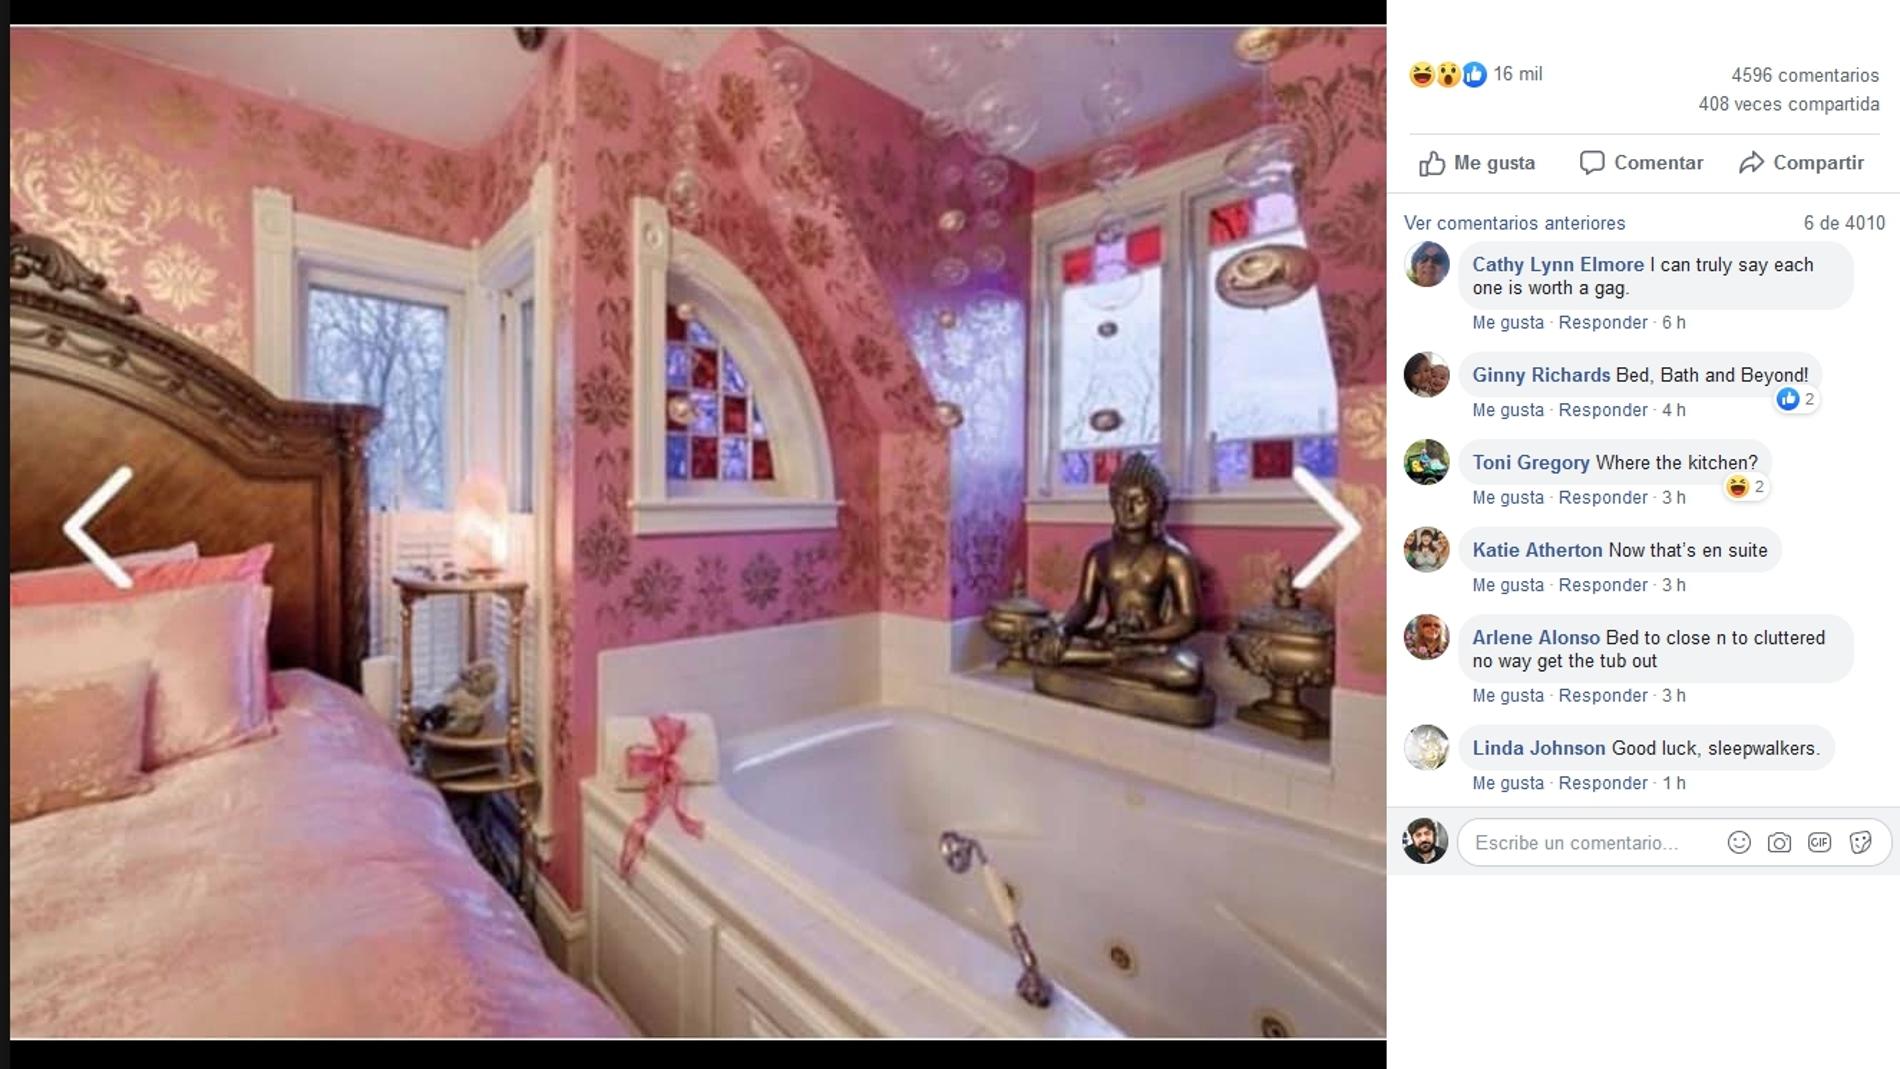 Diseños de casas horribles